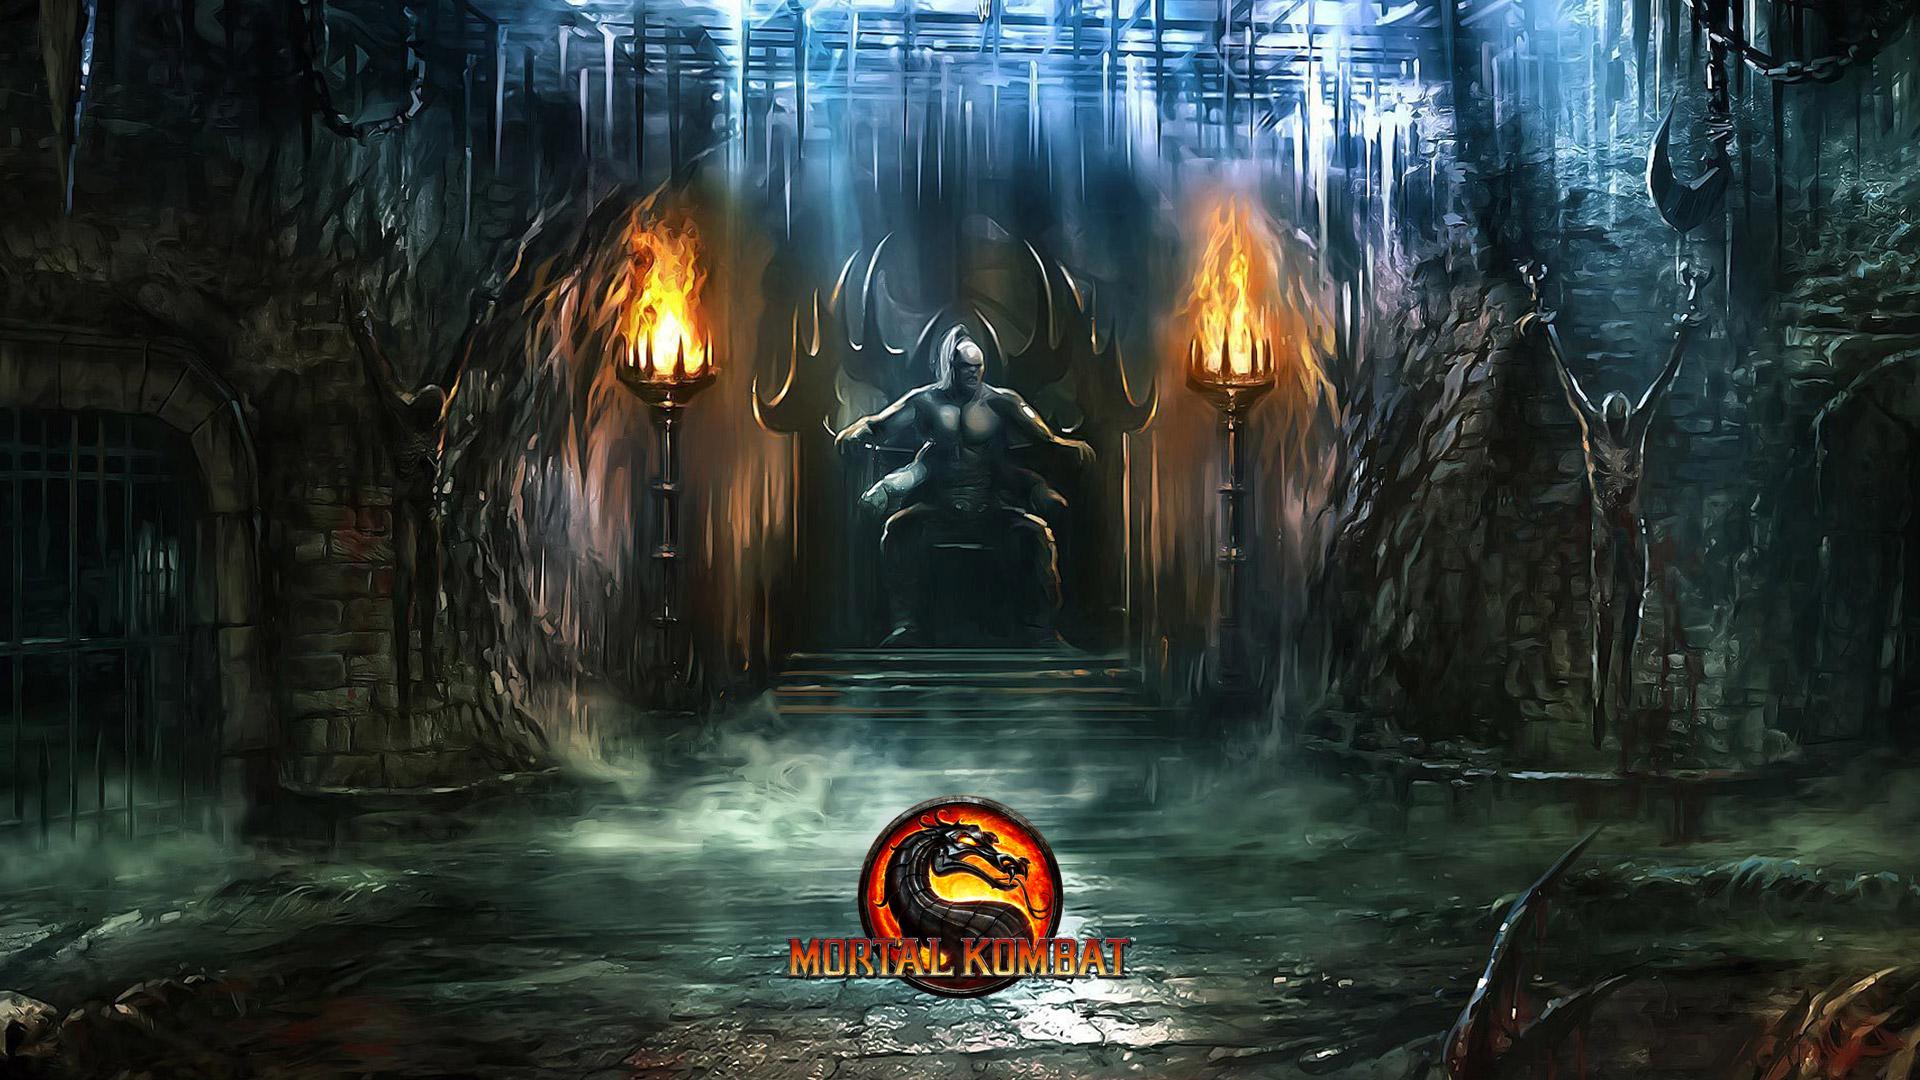 Mortal Kombat Wallpaper in 1920x1080